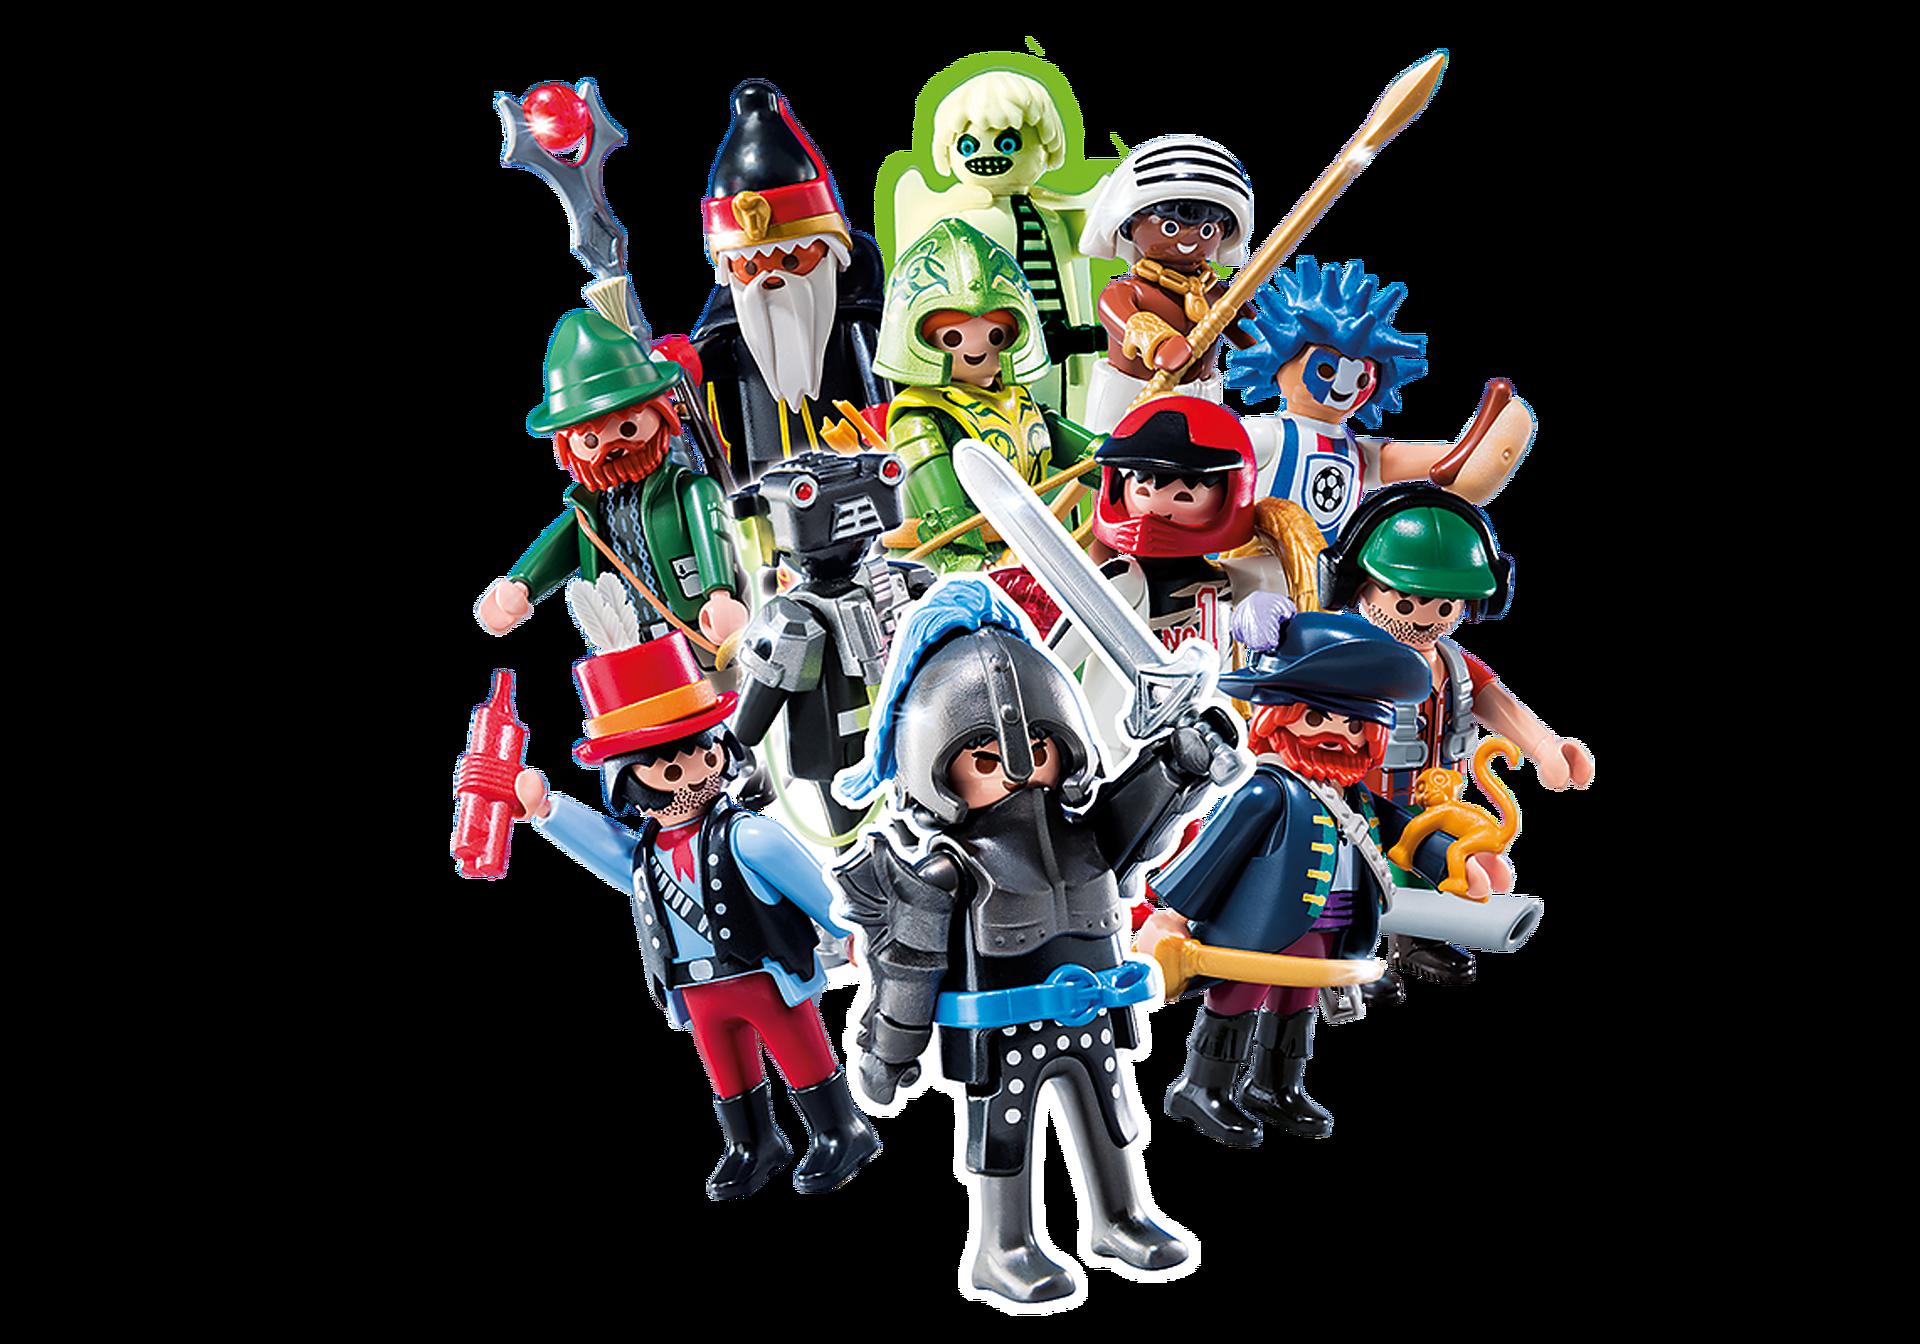 http://media.playmobil.com/i/playmobil/6840_product_detail/PLAYMOBIL Figures Meisjes serie 10